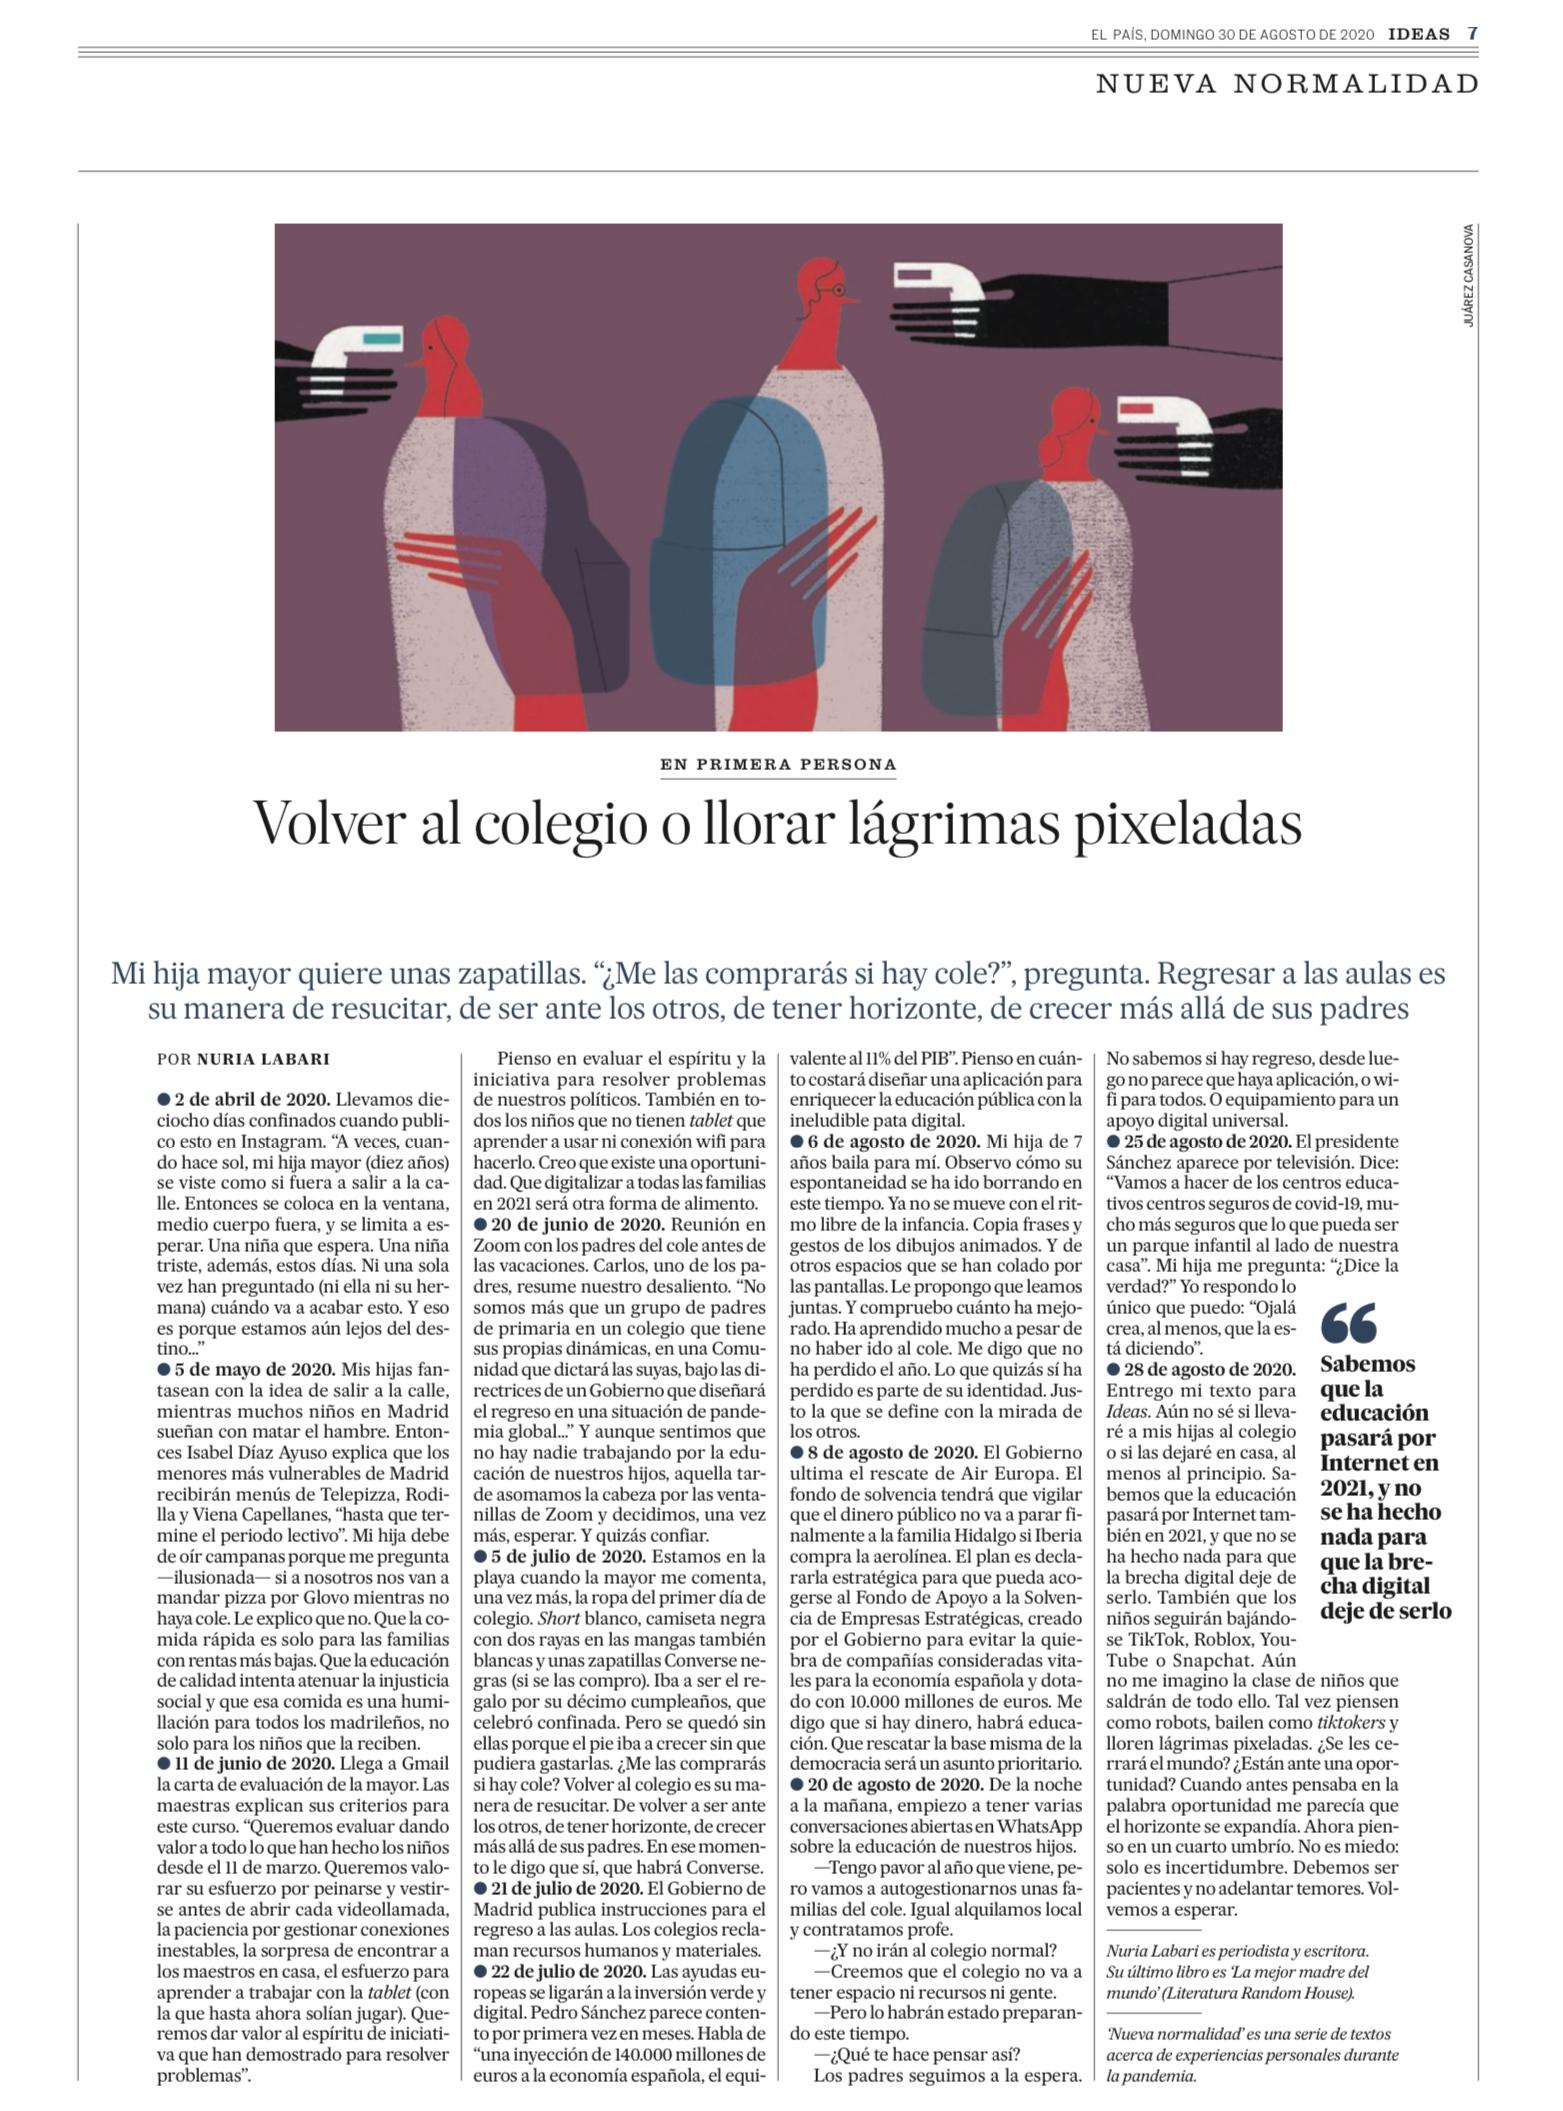 Juarez Casanova El País